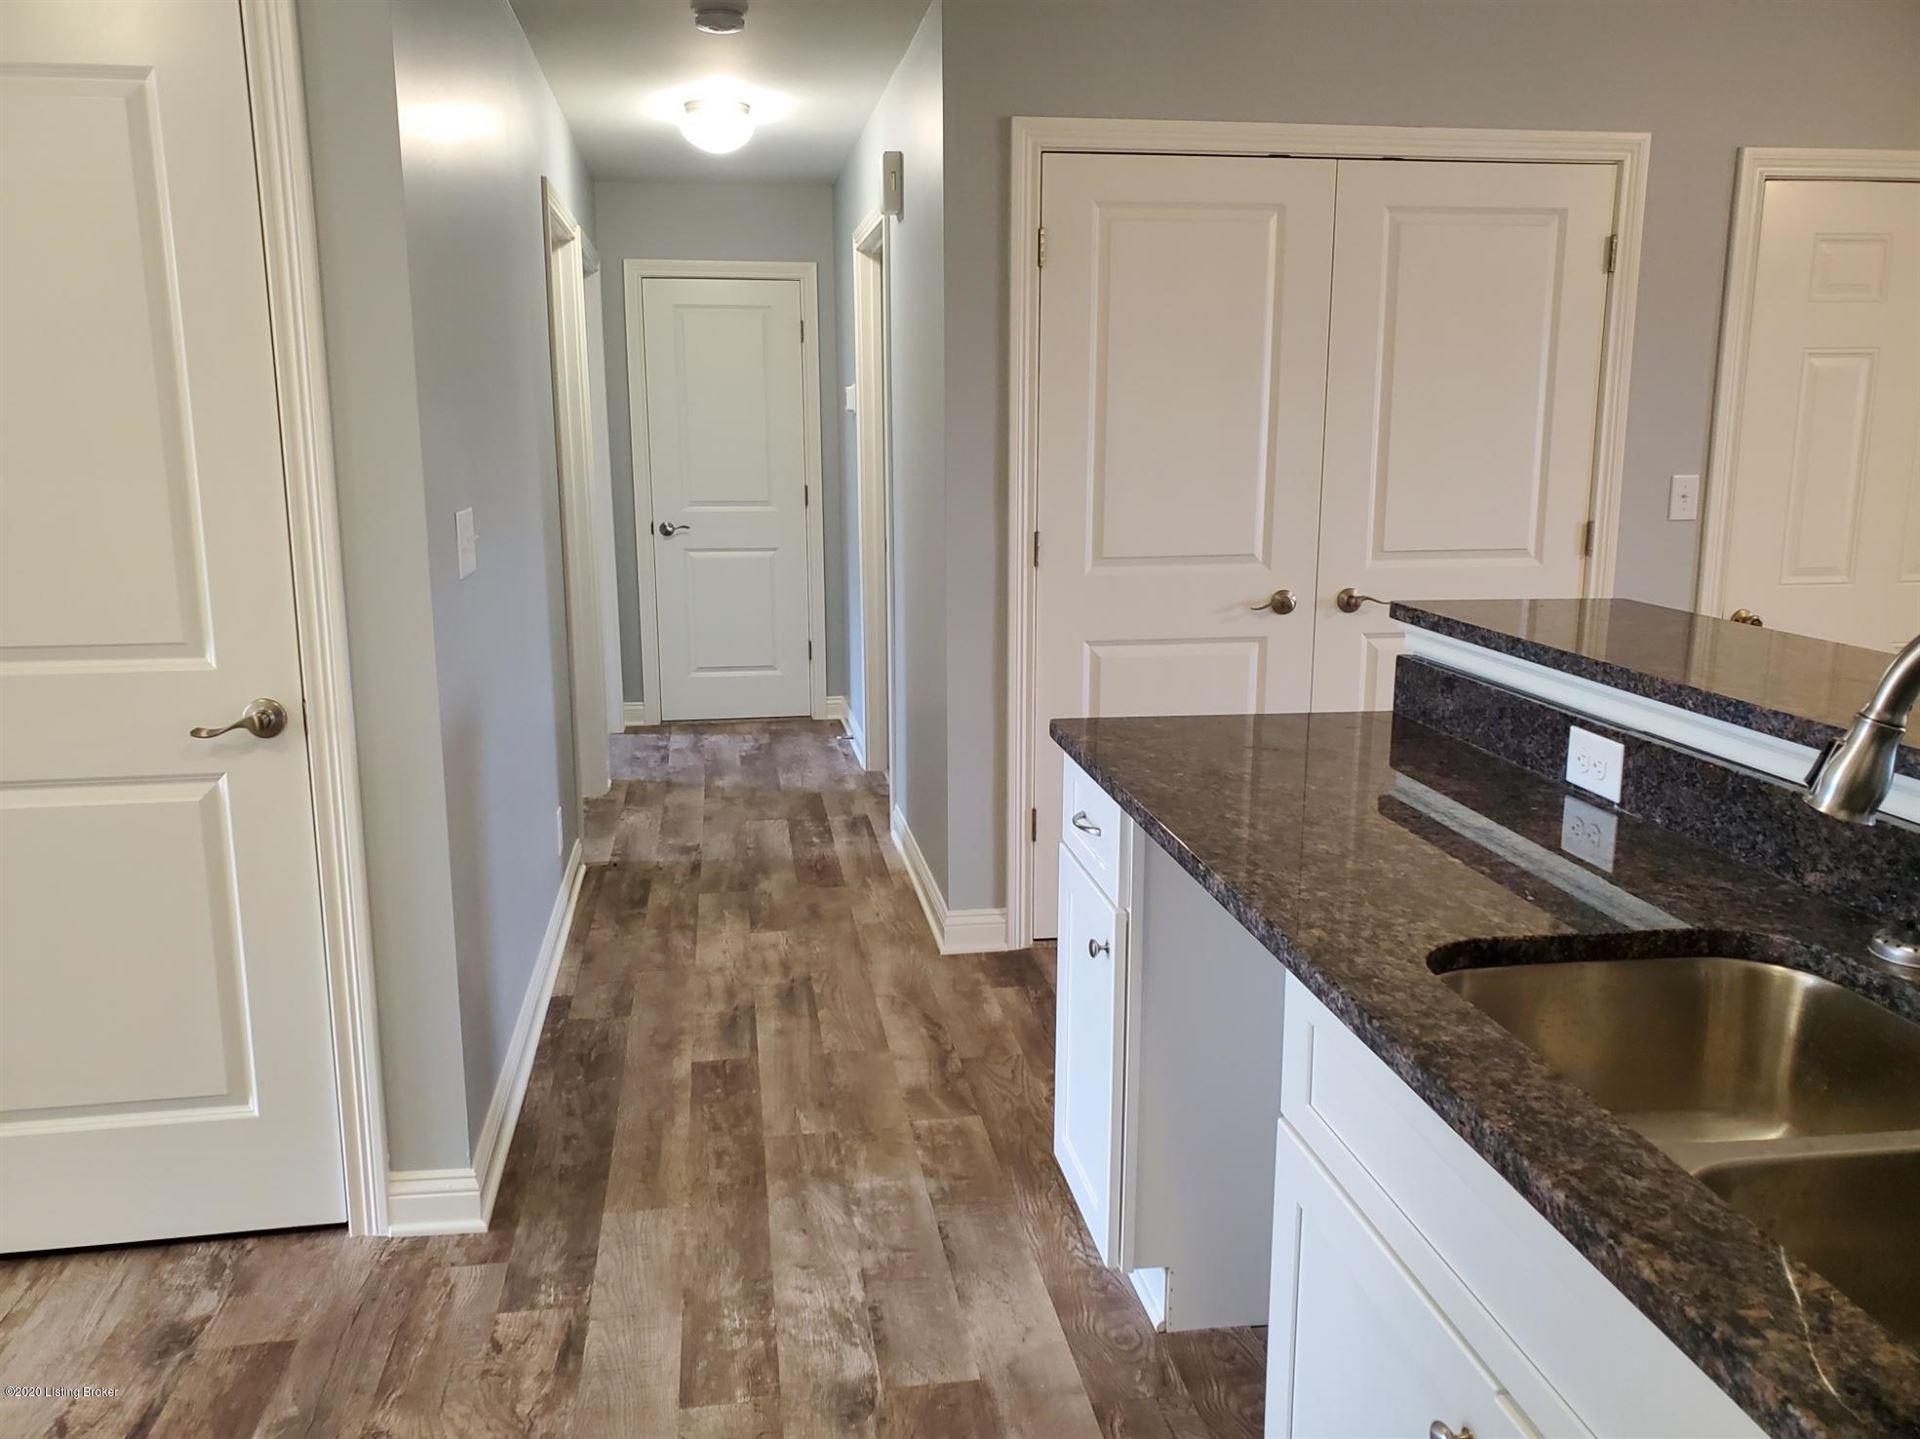 Property Image Of 413 Woodlake Dr In Mt Washington, Ky